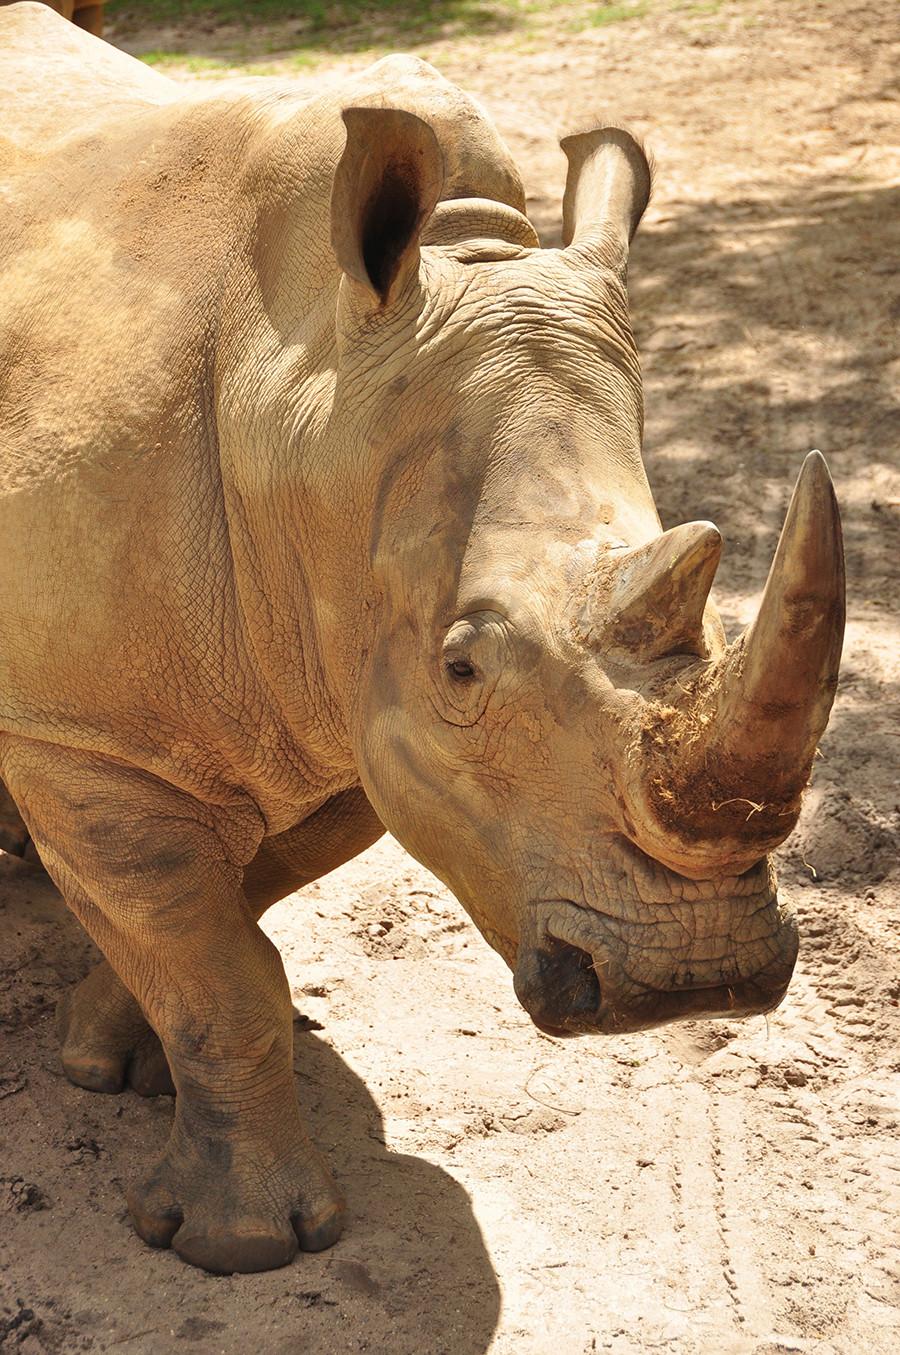 New Animal Experience to Get 'Up Close with Rhinos' Starting Nov. 1 at Disney's Animal Kingdom